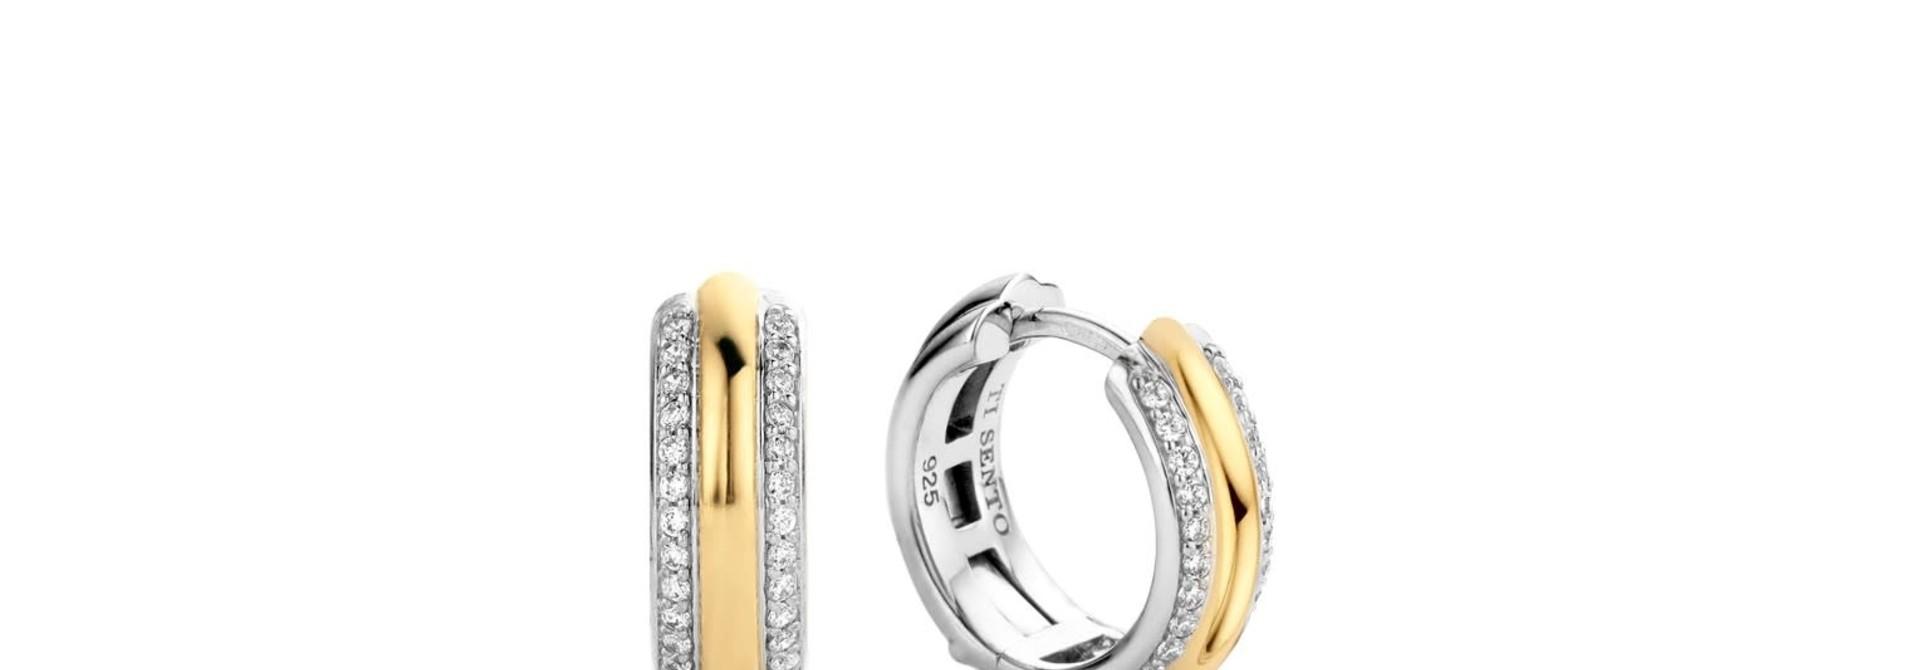 TI SENTO - Milano Earrings 7786ZY